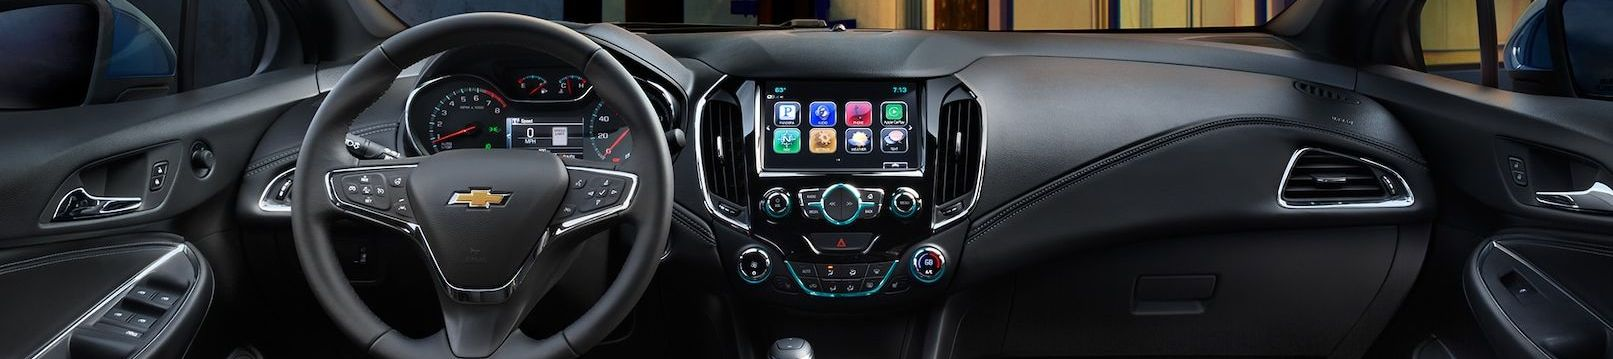 2018 Chevrolet Cruze Center Console